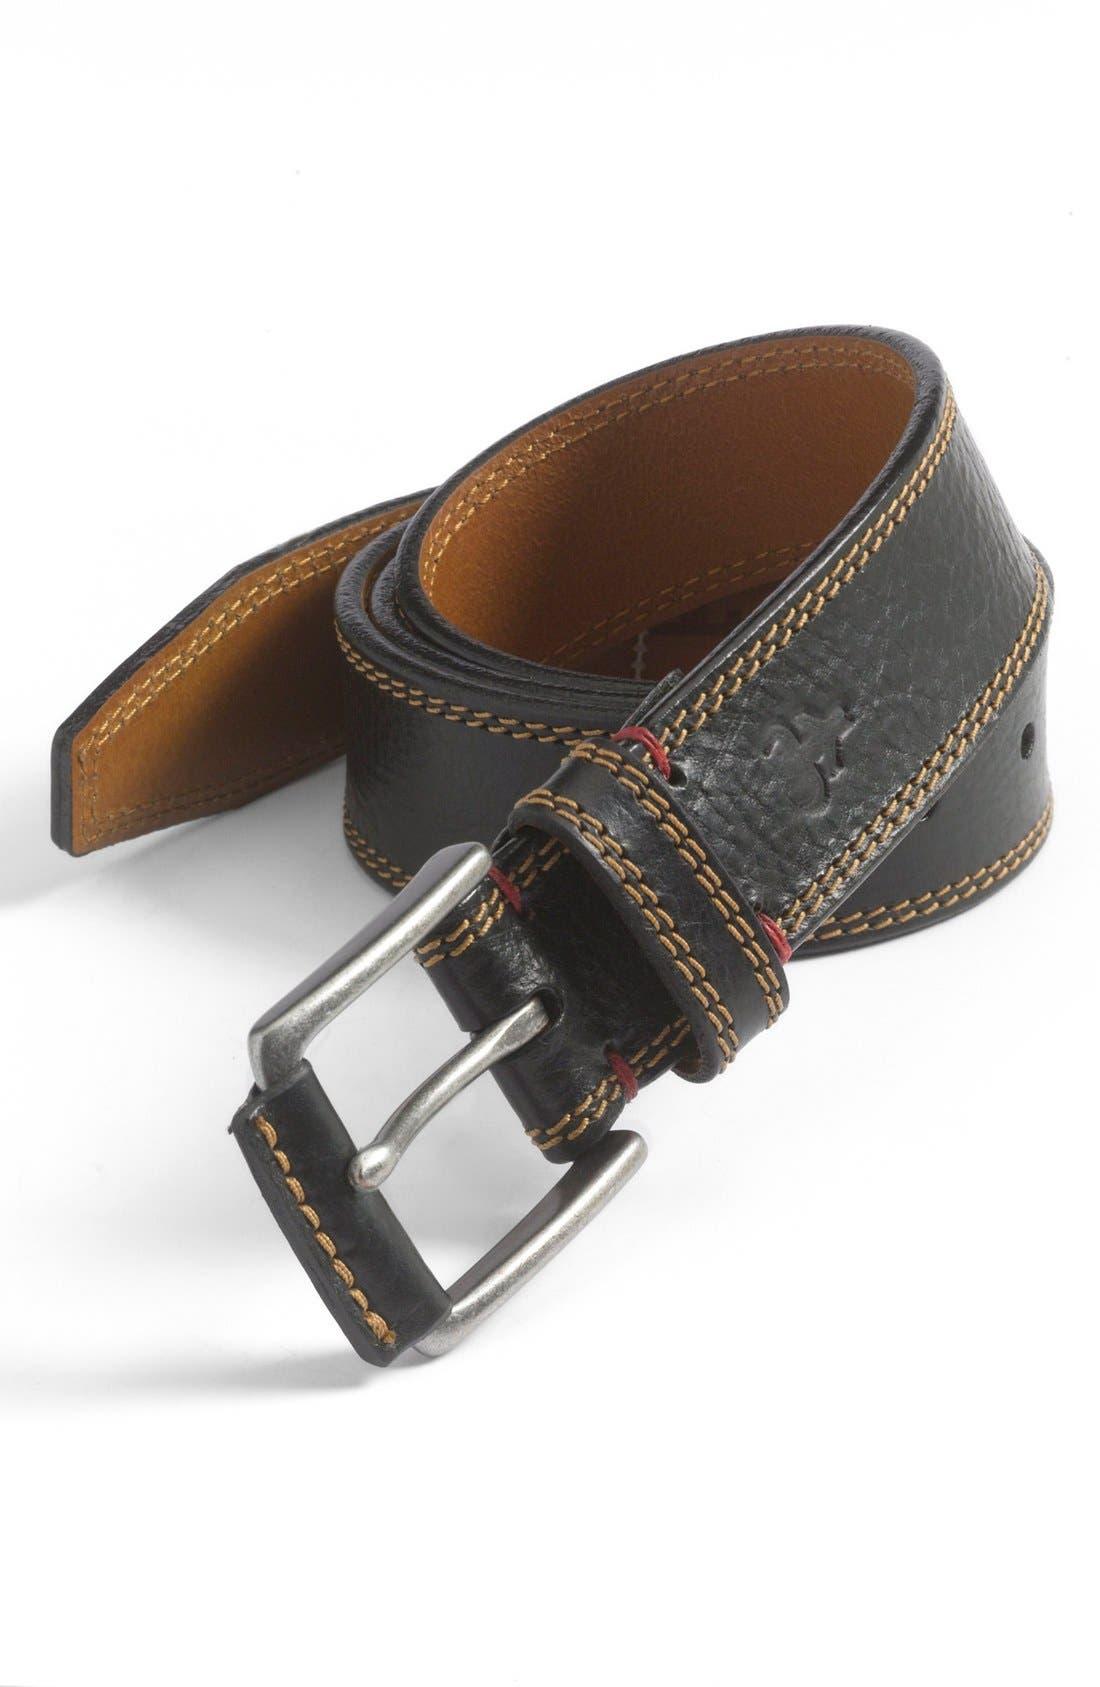 Trask 'Gallatin' Belt